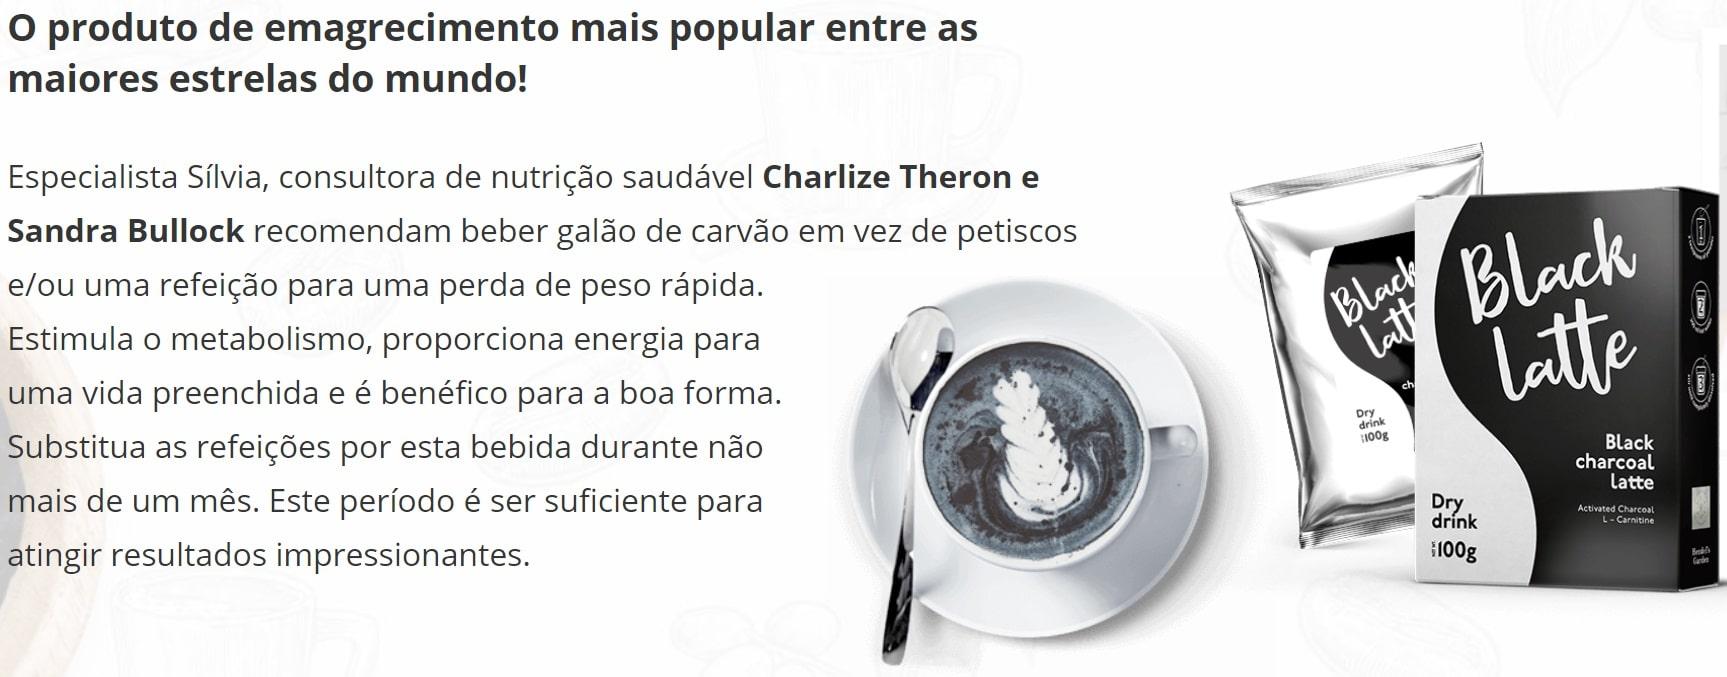 black-latte-pt2-min